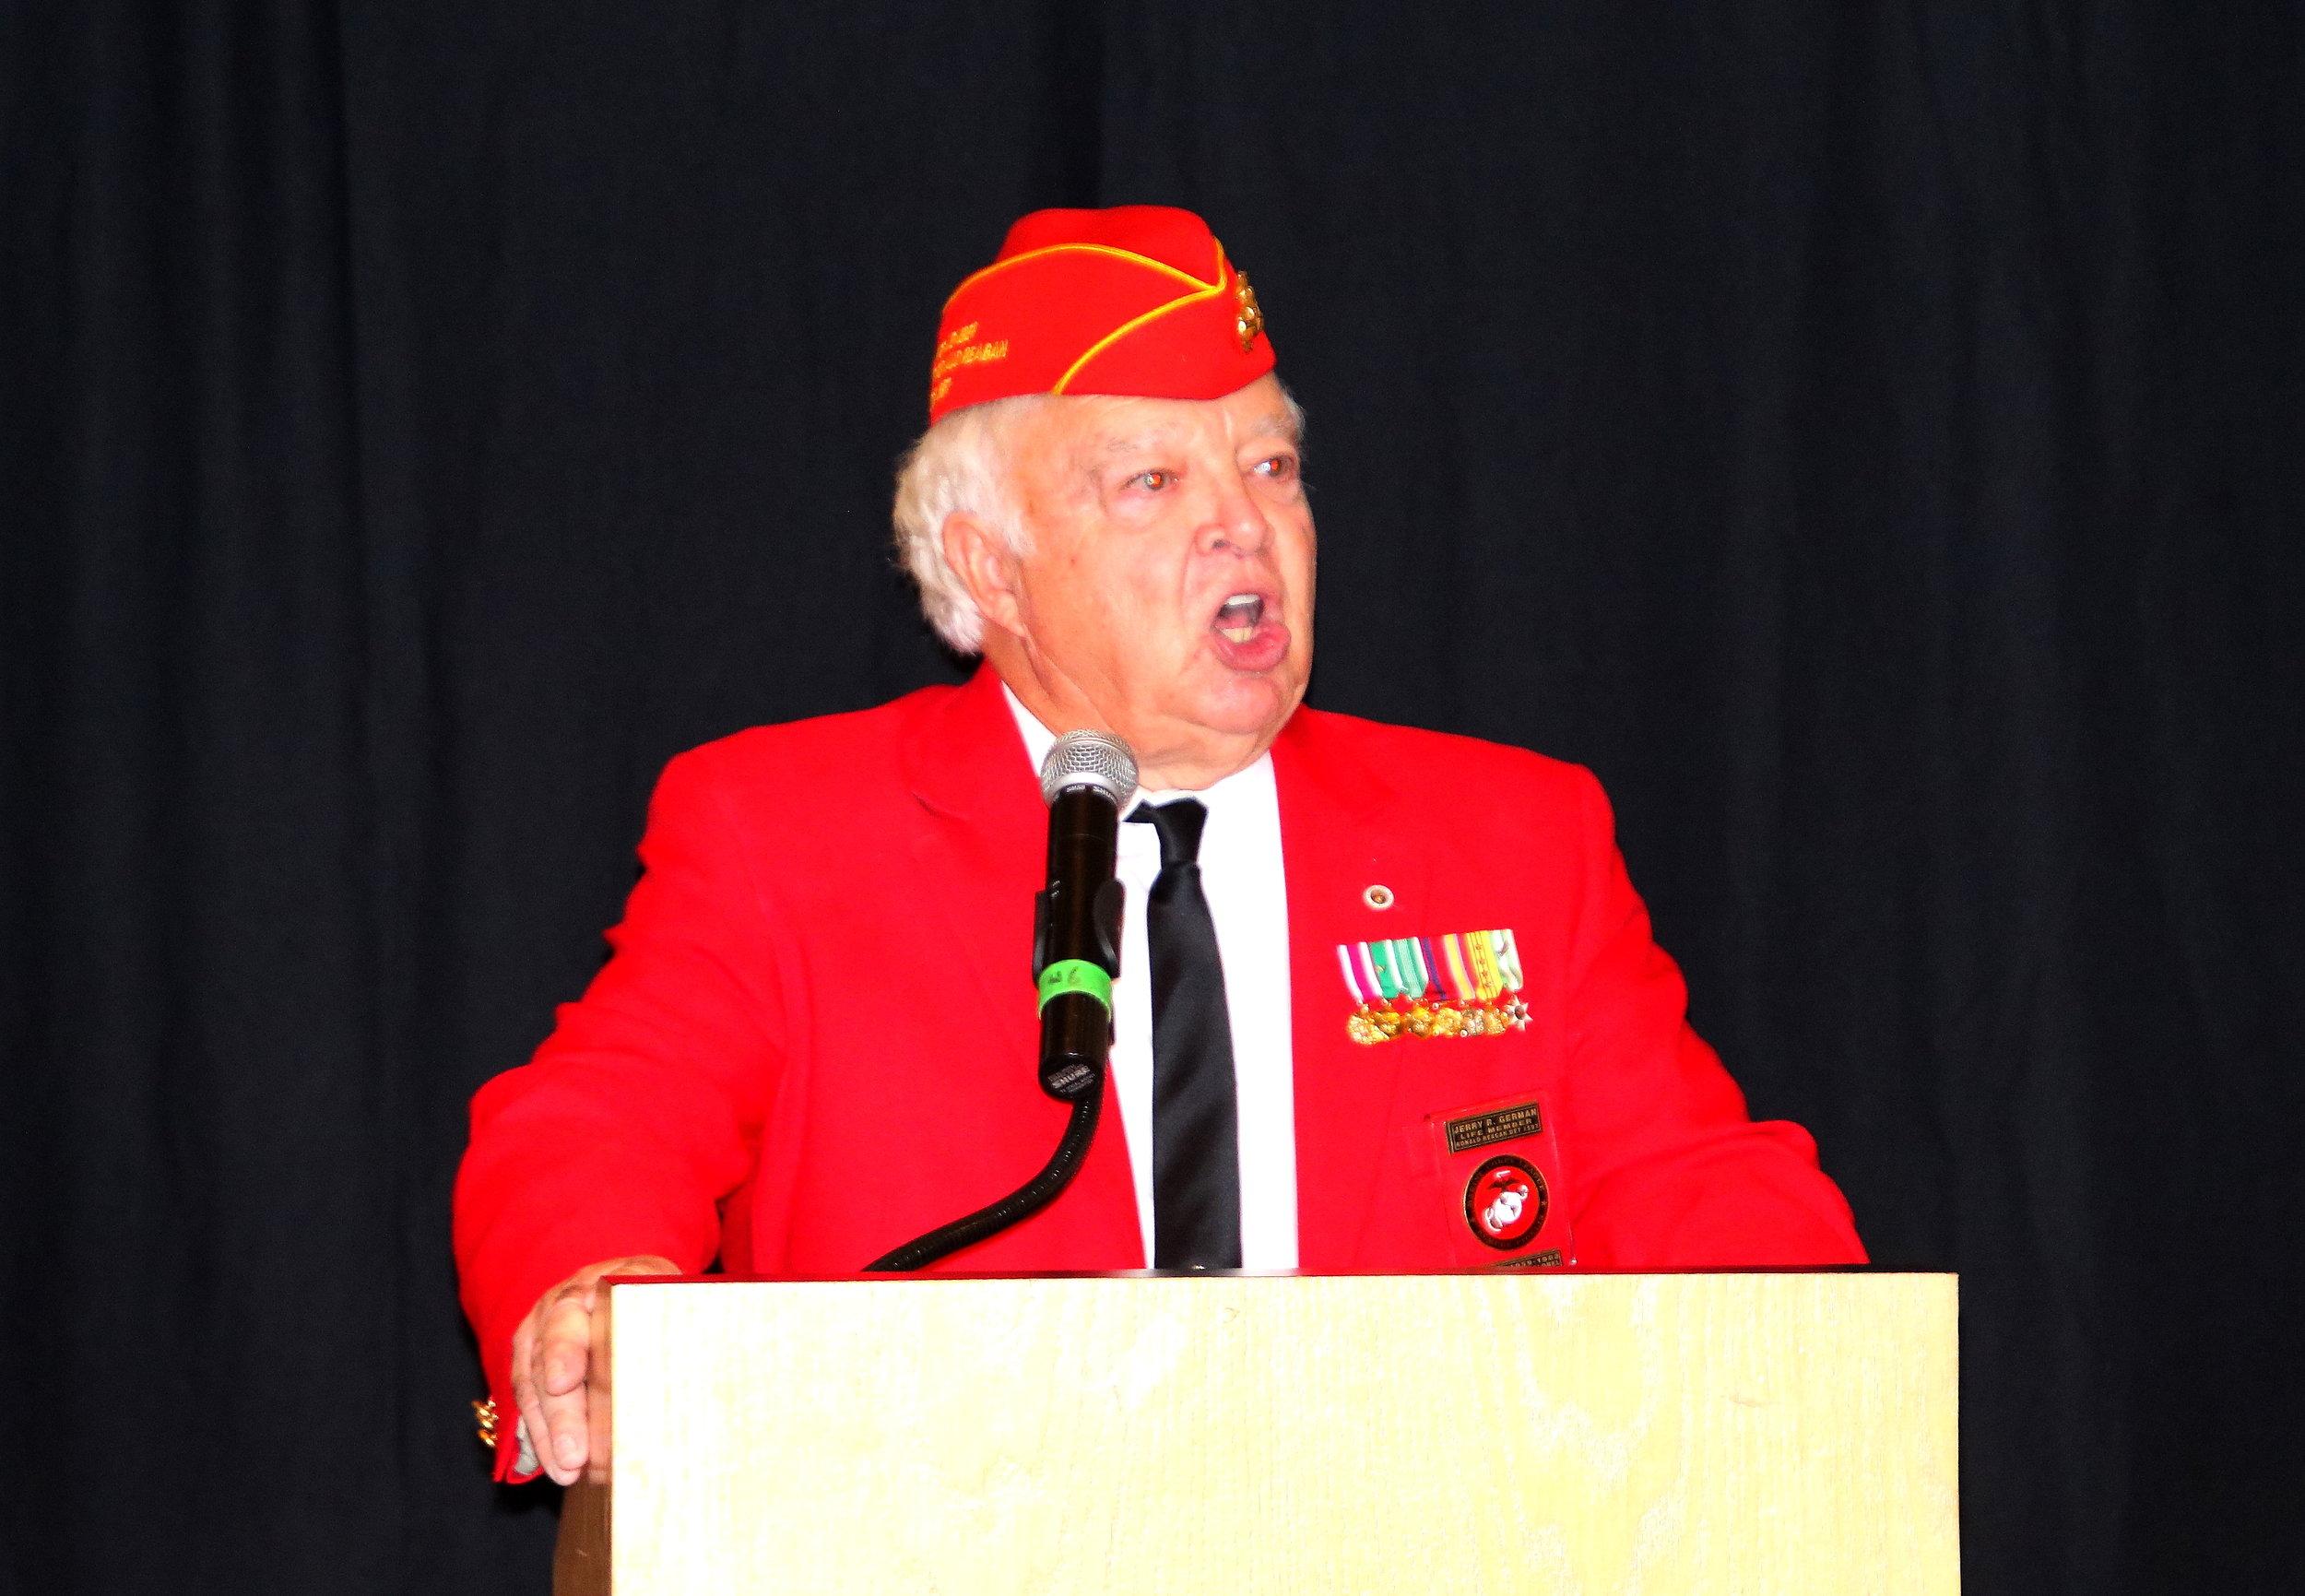 Jerry German as MC of Opening Ceremonies